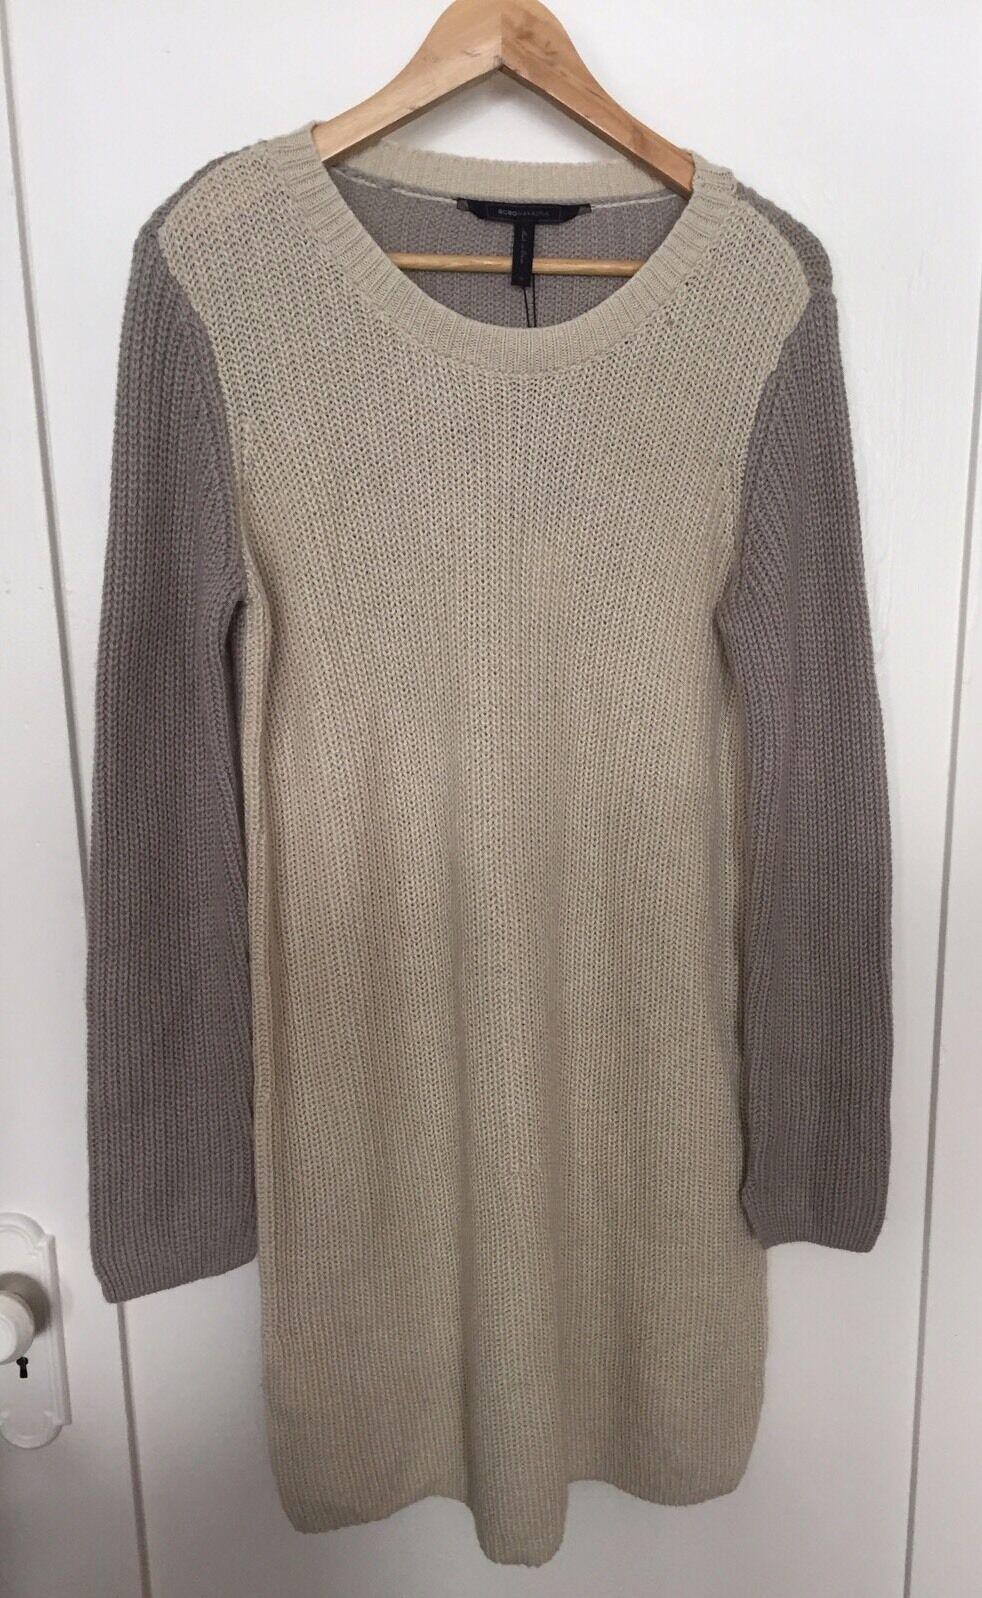 NWT BCBG Max Azria-  Nylah  Oatmeal Knit Sweater Dress- Size M Org.